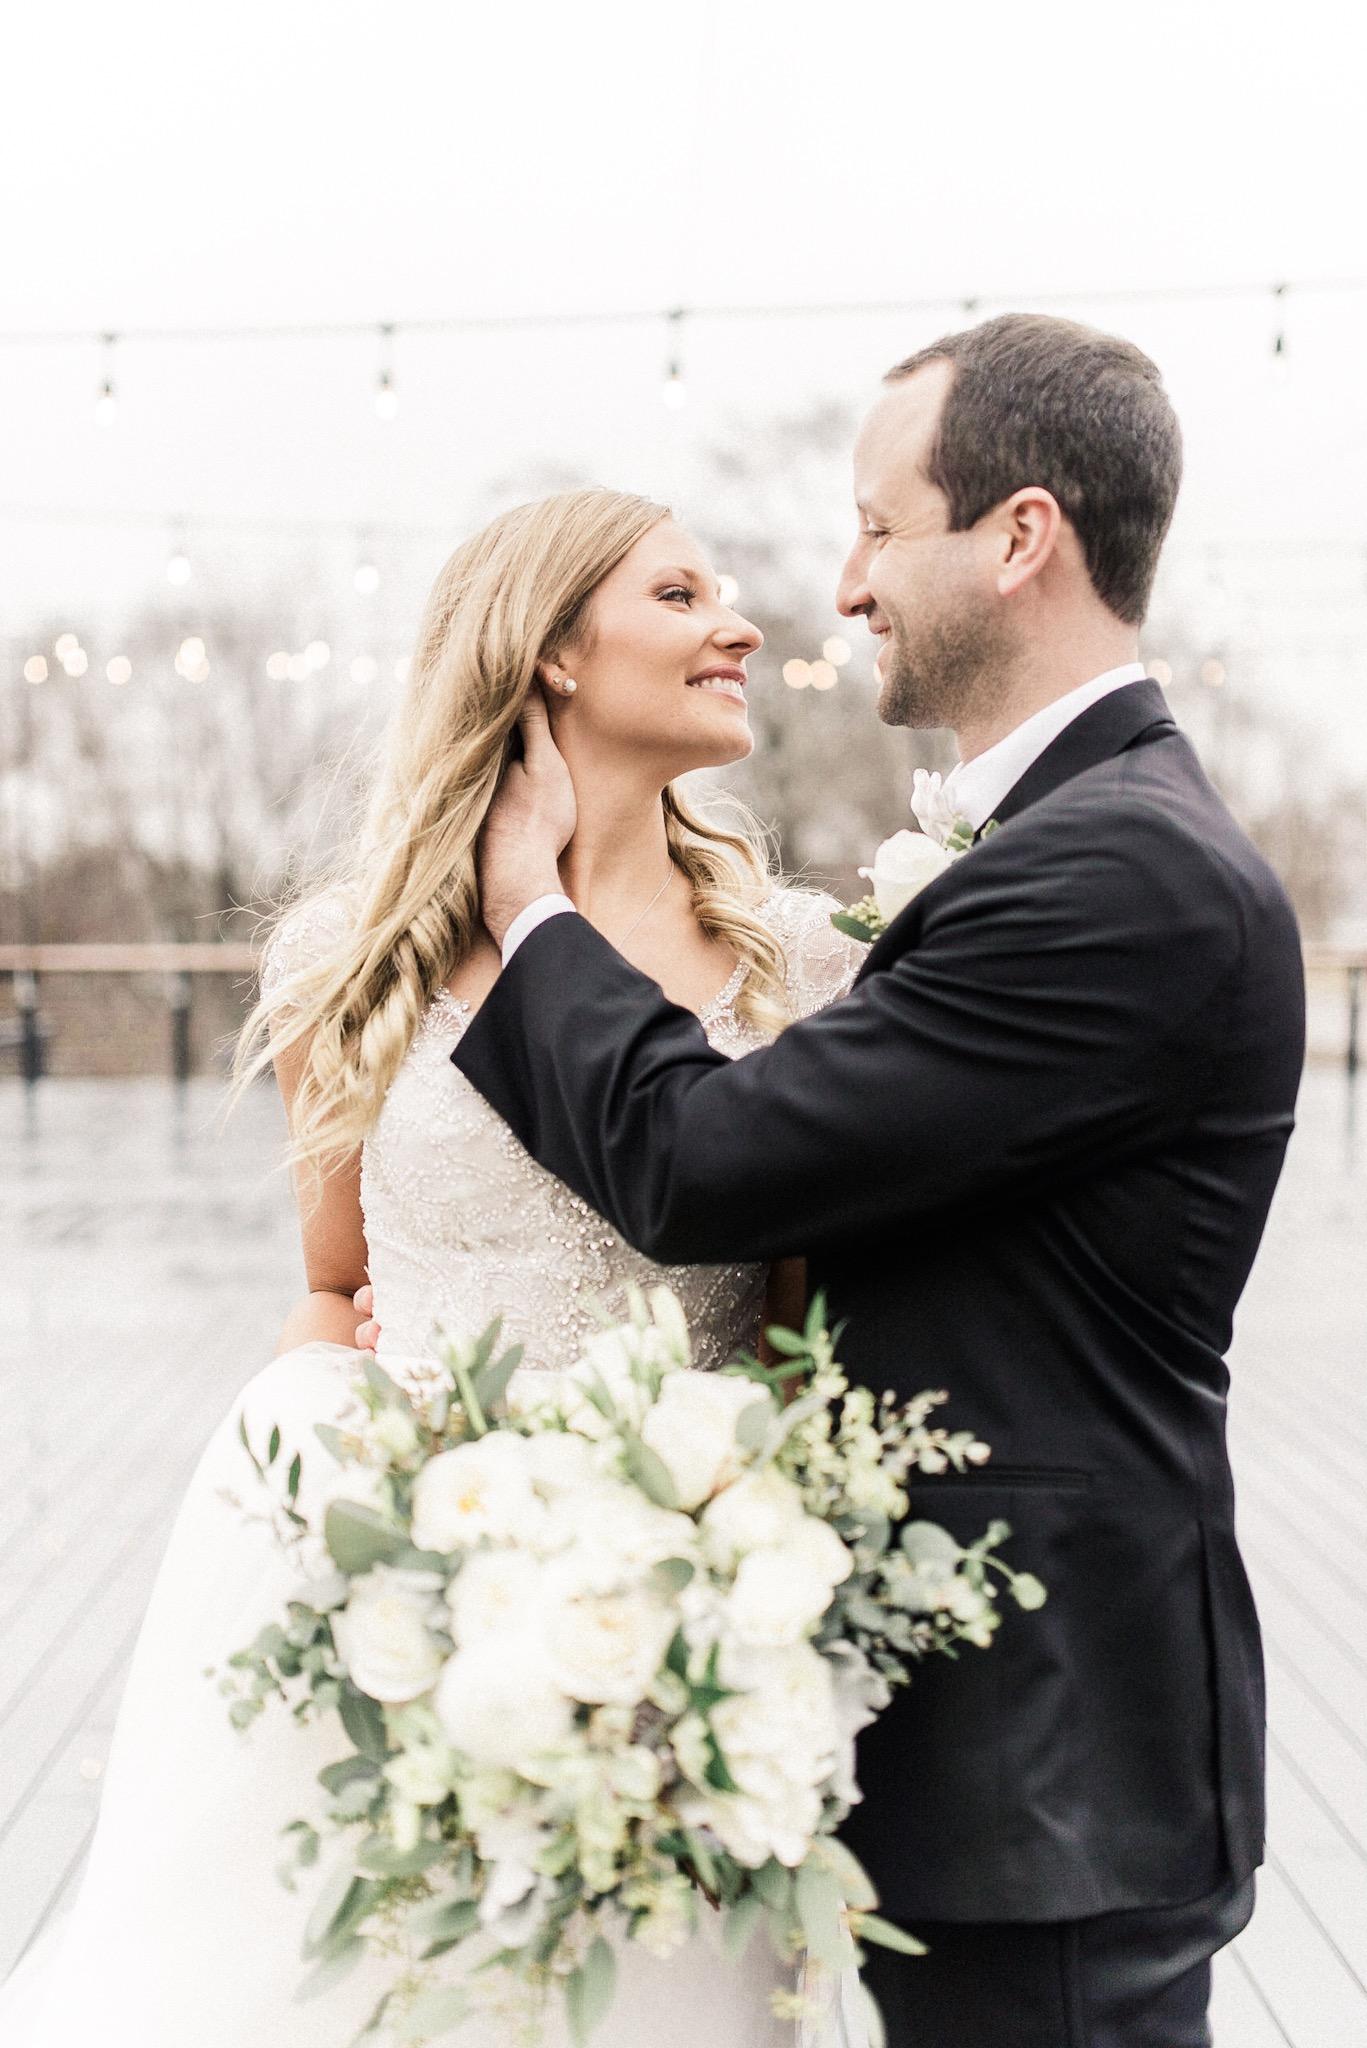 Jill + Matt | A Classic and Romantic Wedding at the Biltwell Event Center in Indianapolis, IN | International Destination Elopement Photographers